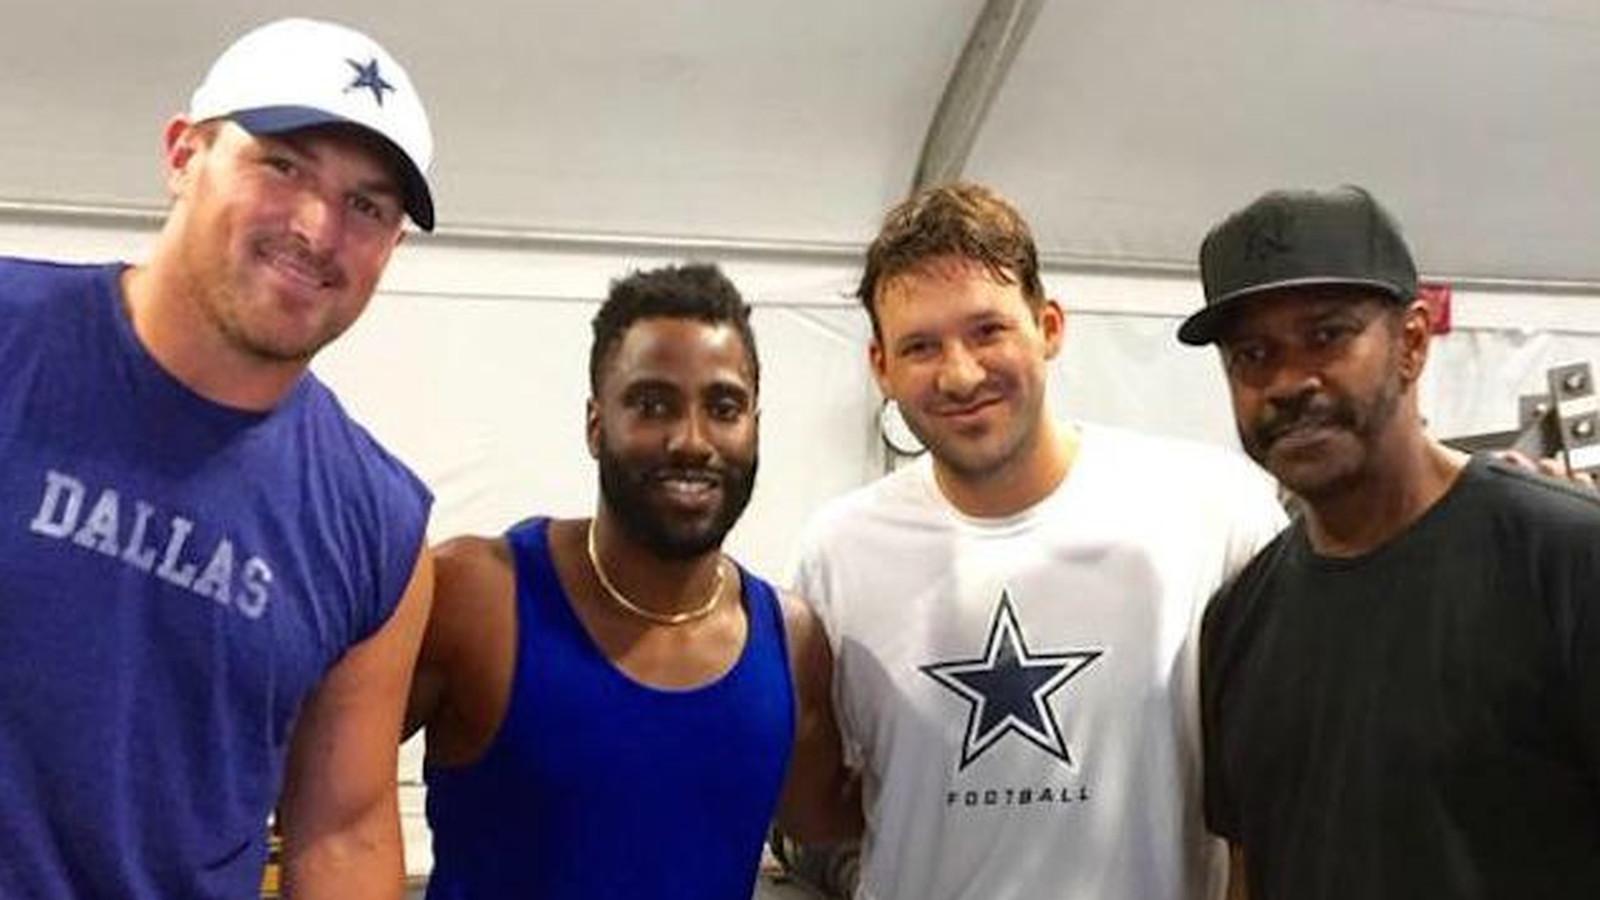 Denzel Washington Attends Dallas Cowboys Practice With His